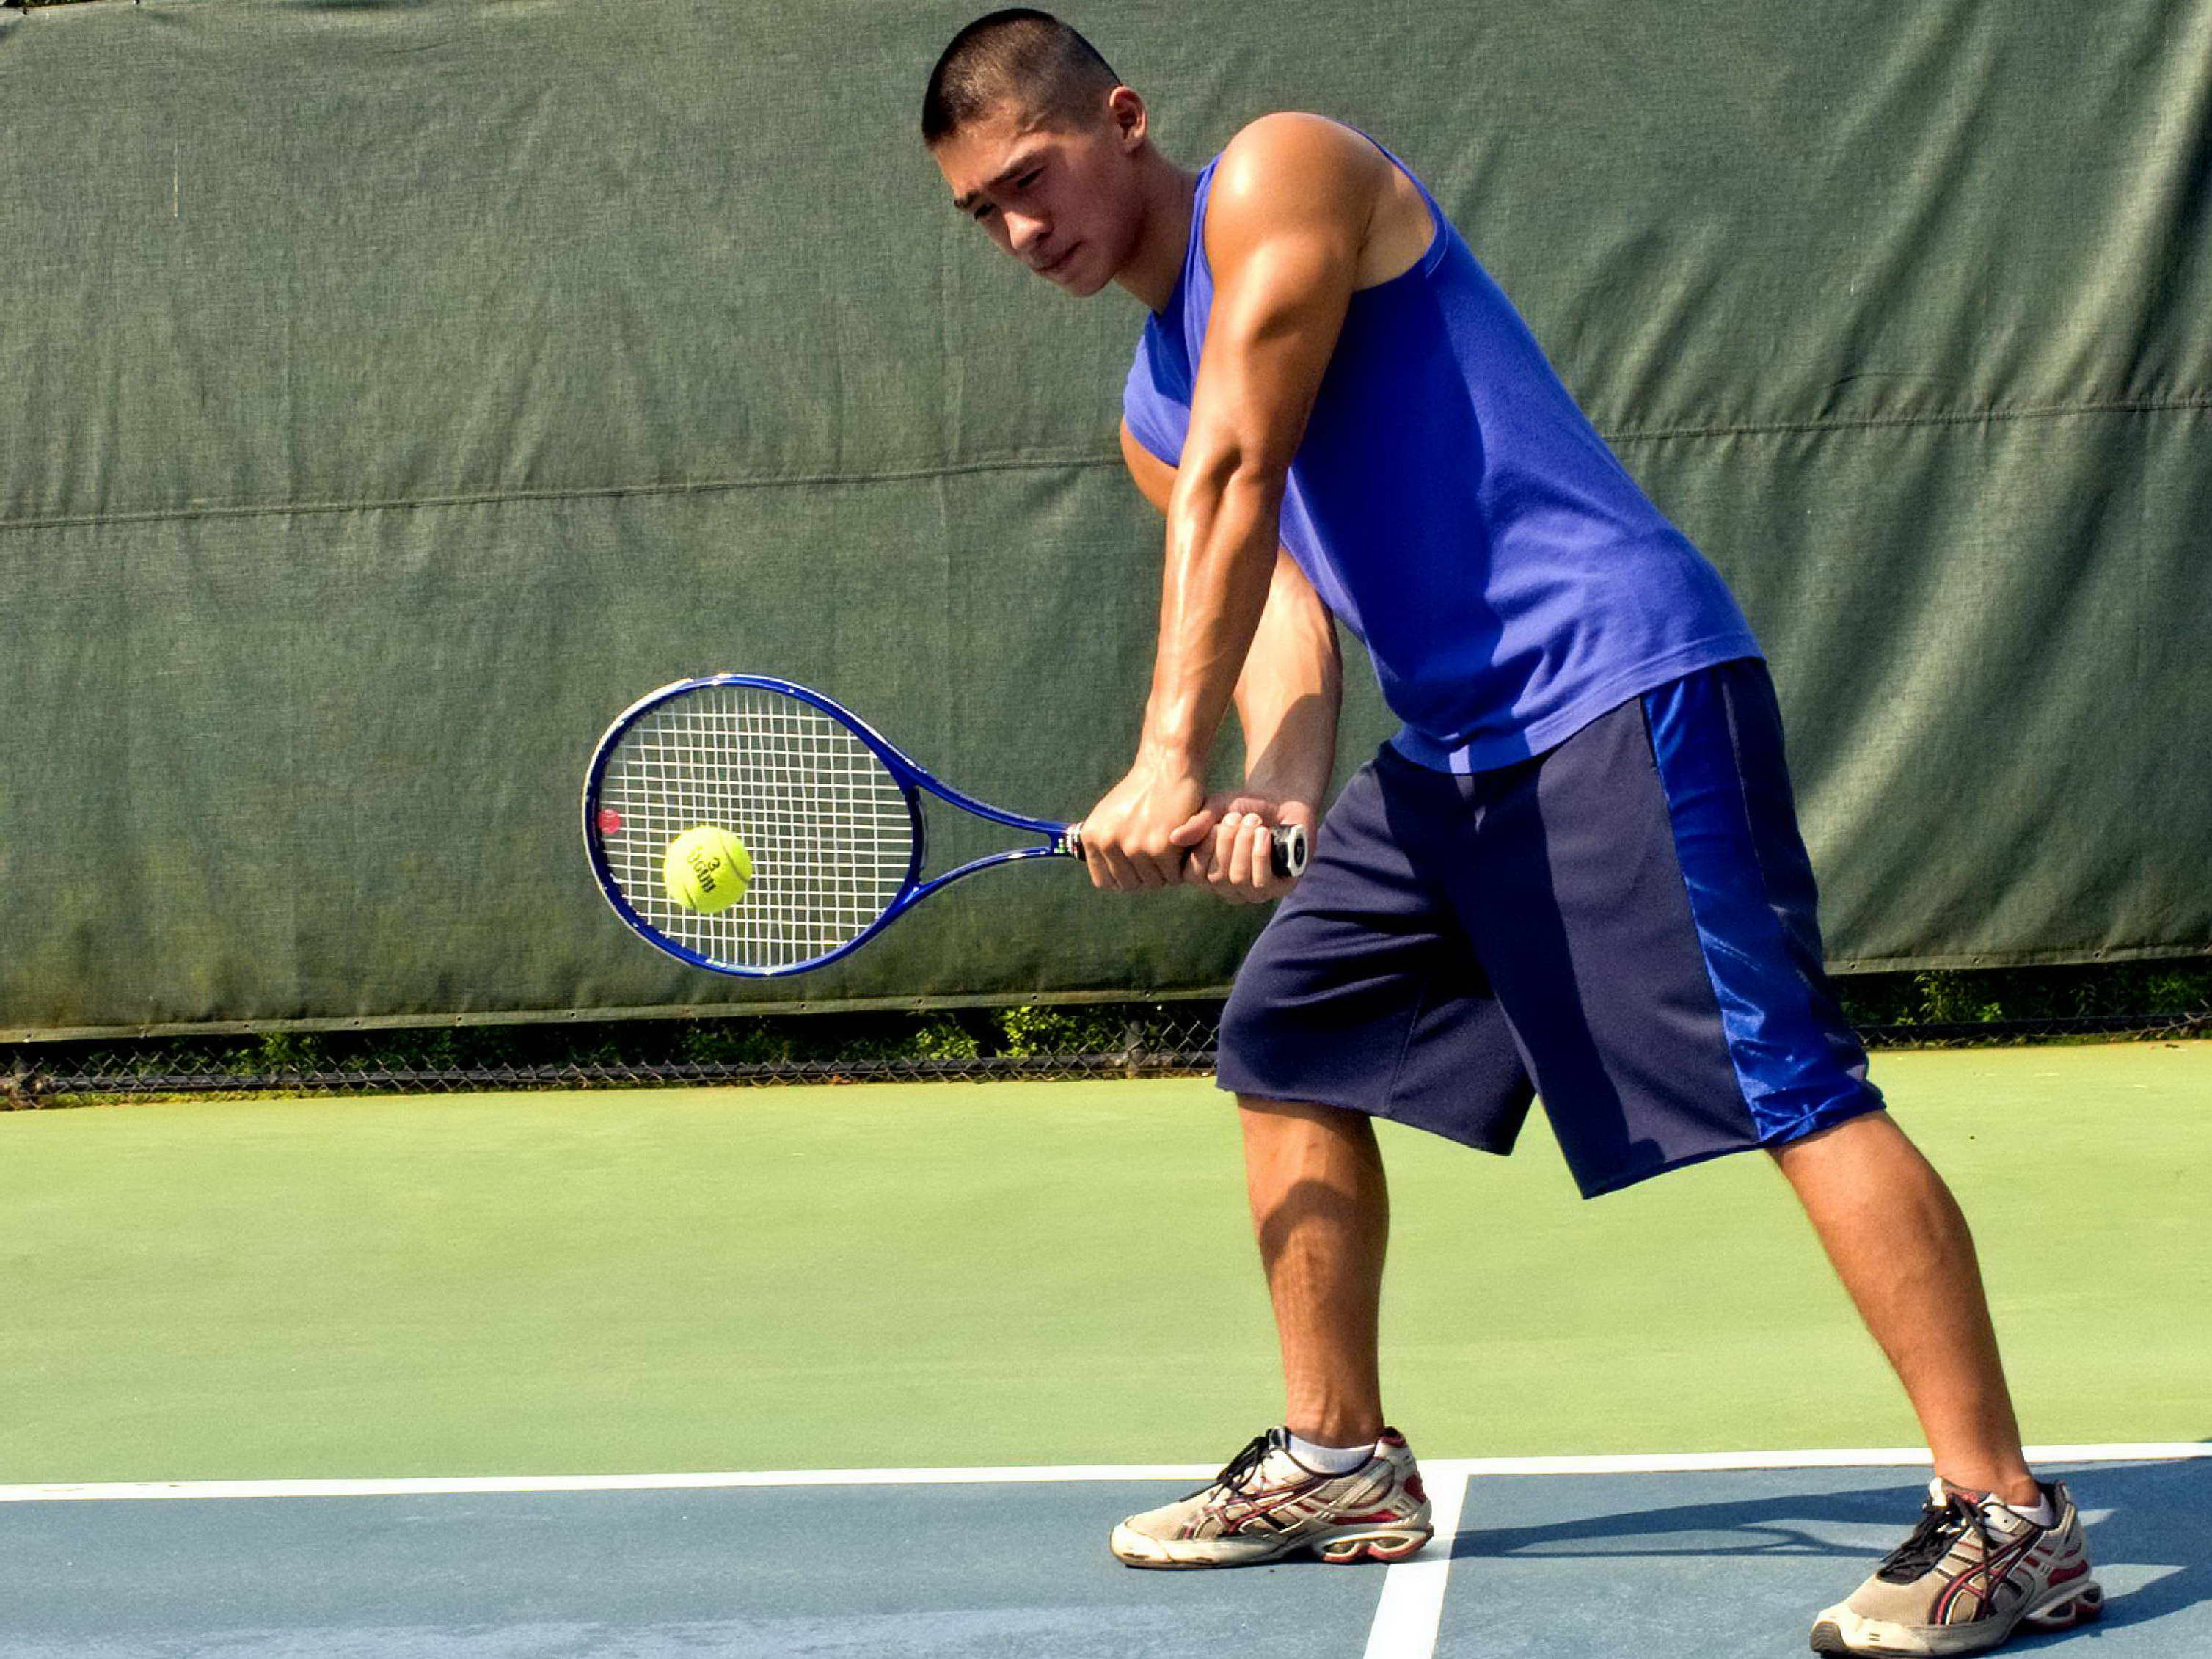 Free photograph; young, man, playing, sport, game, tennis, stadium